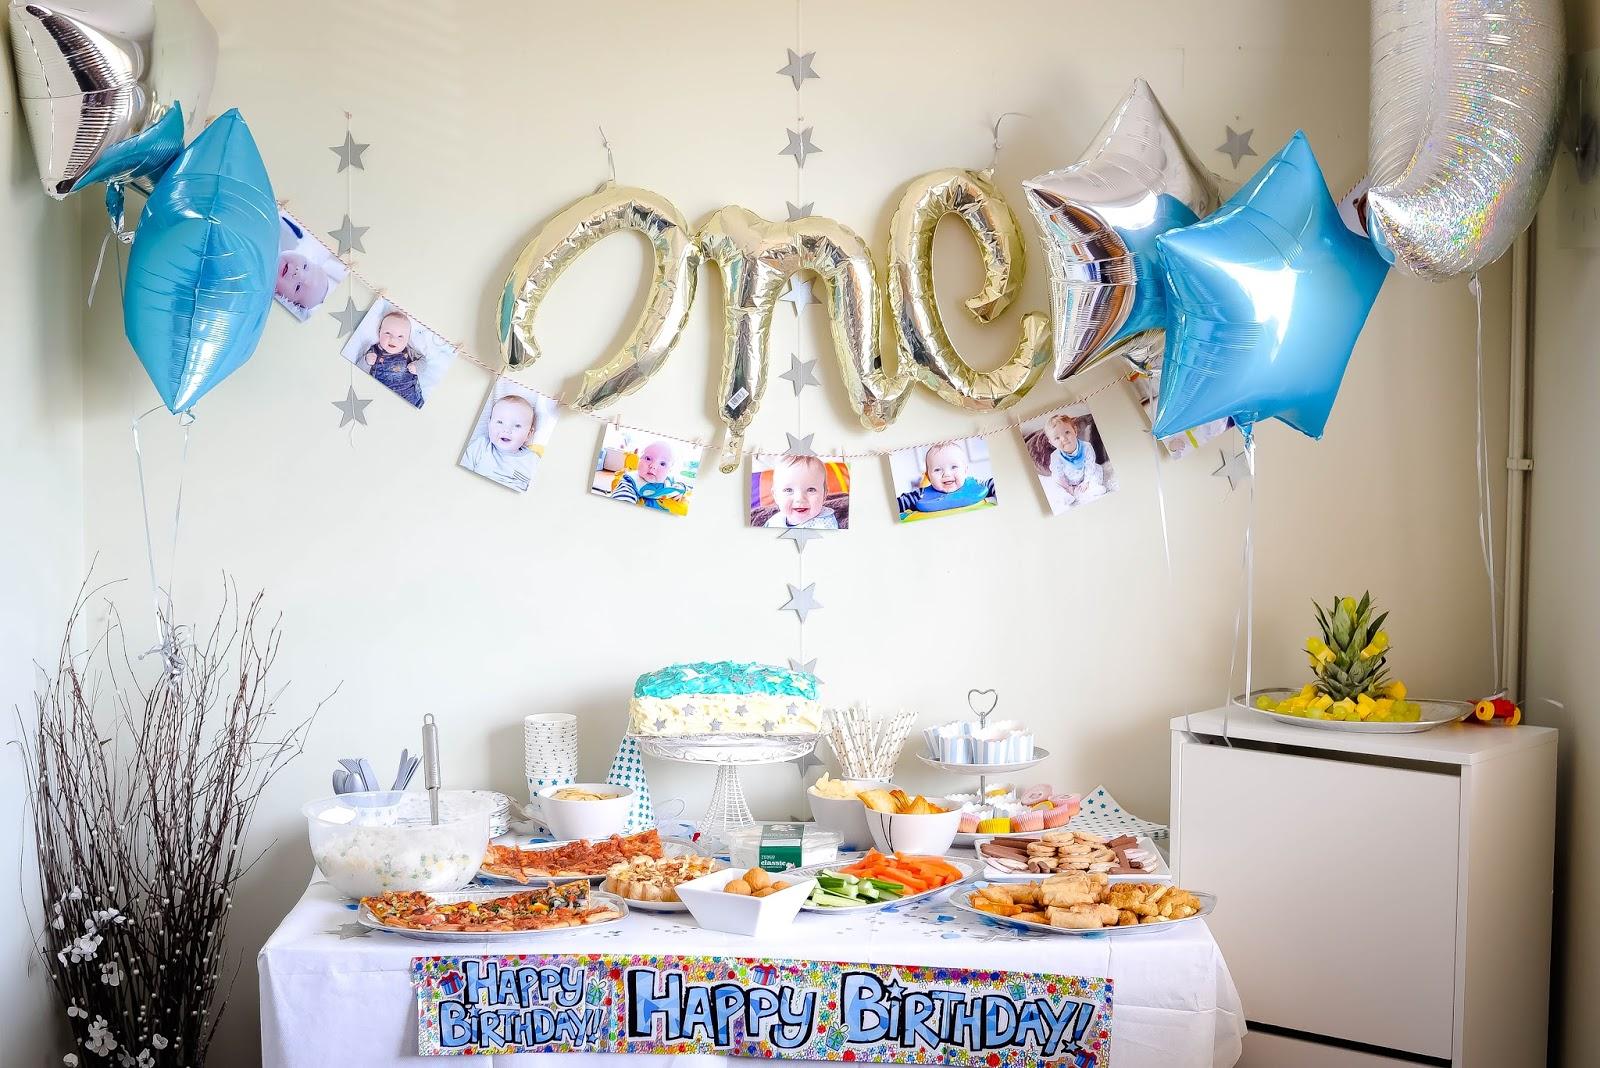 1st birthday decor, 1st birthday, party decor kids, baby birthday decor